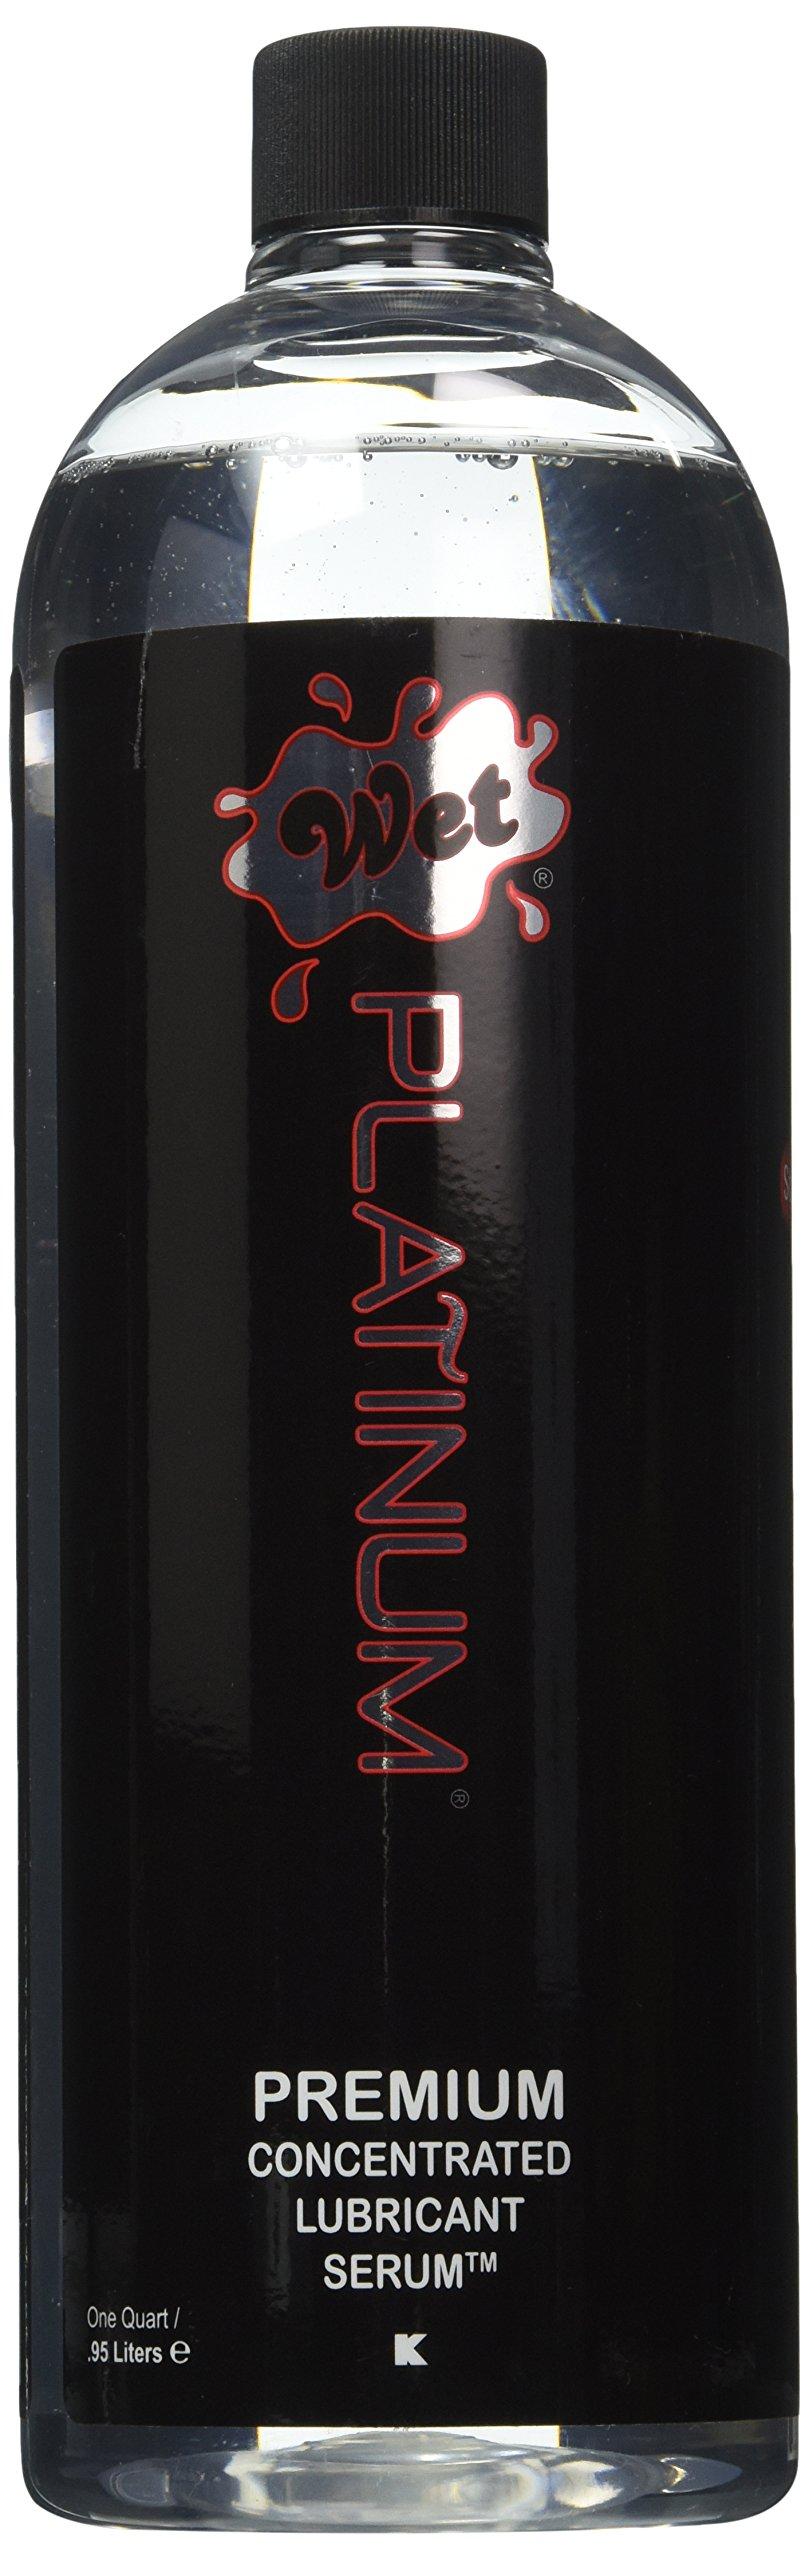 Wet Lubes Platinum Quart Lubricant, 1 Quart Bottle by Wet Lubes